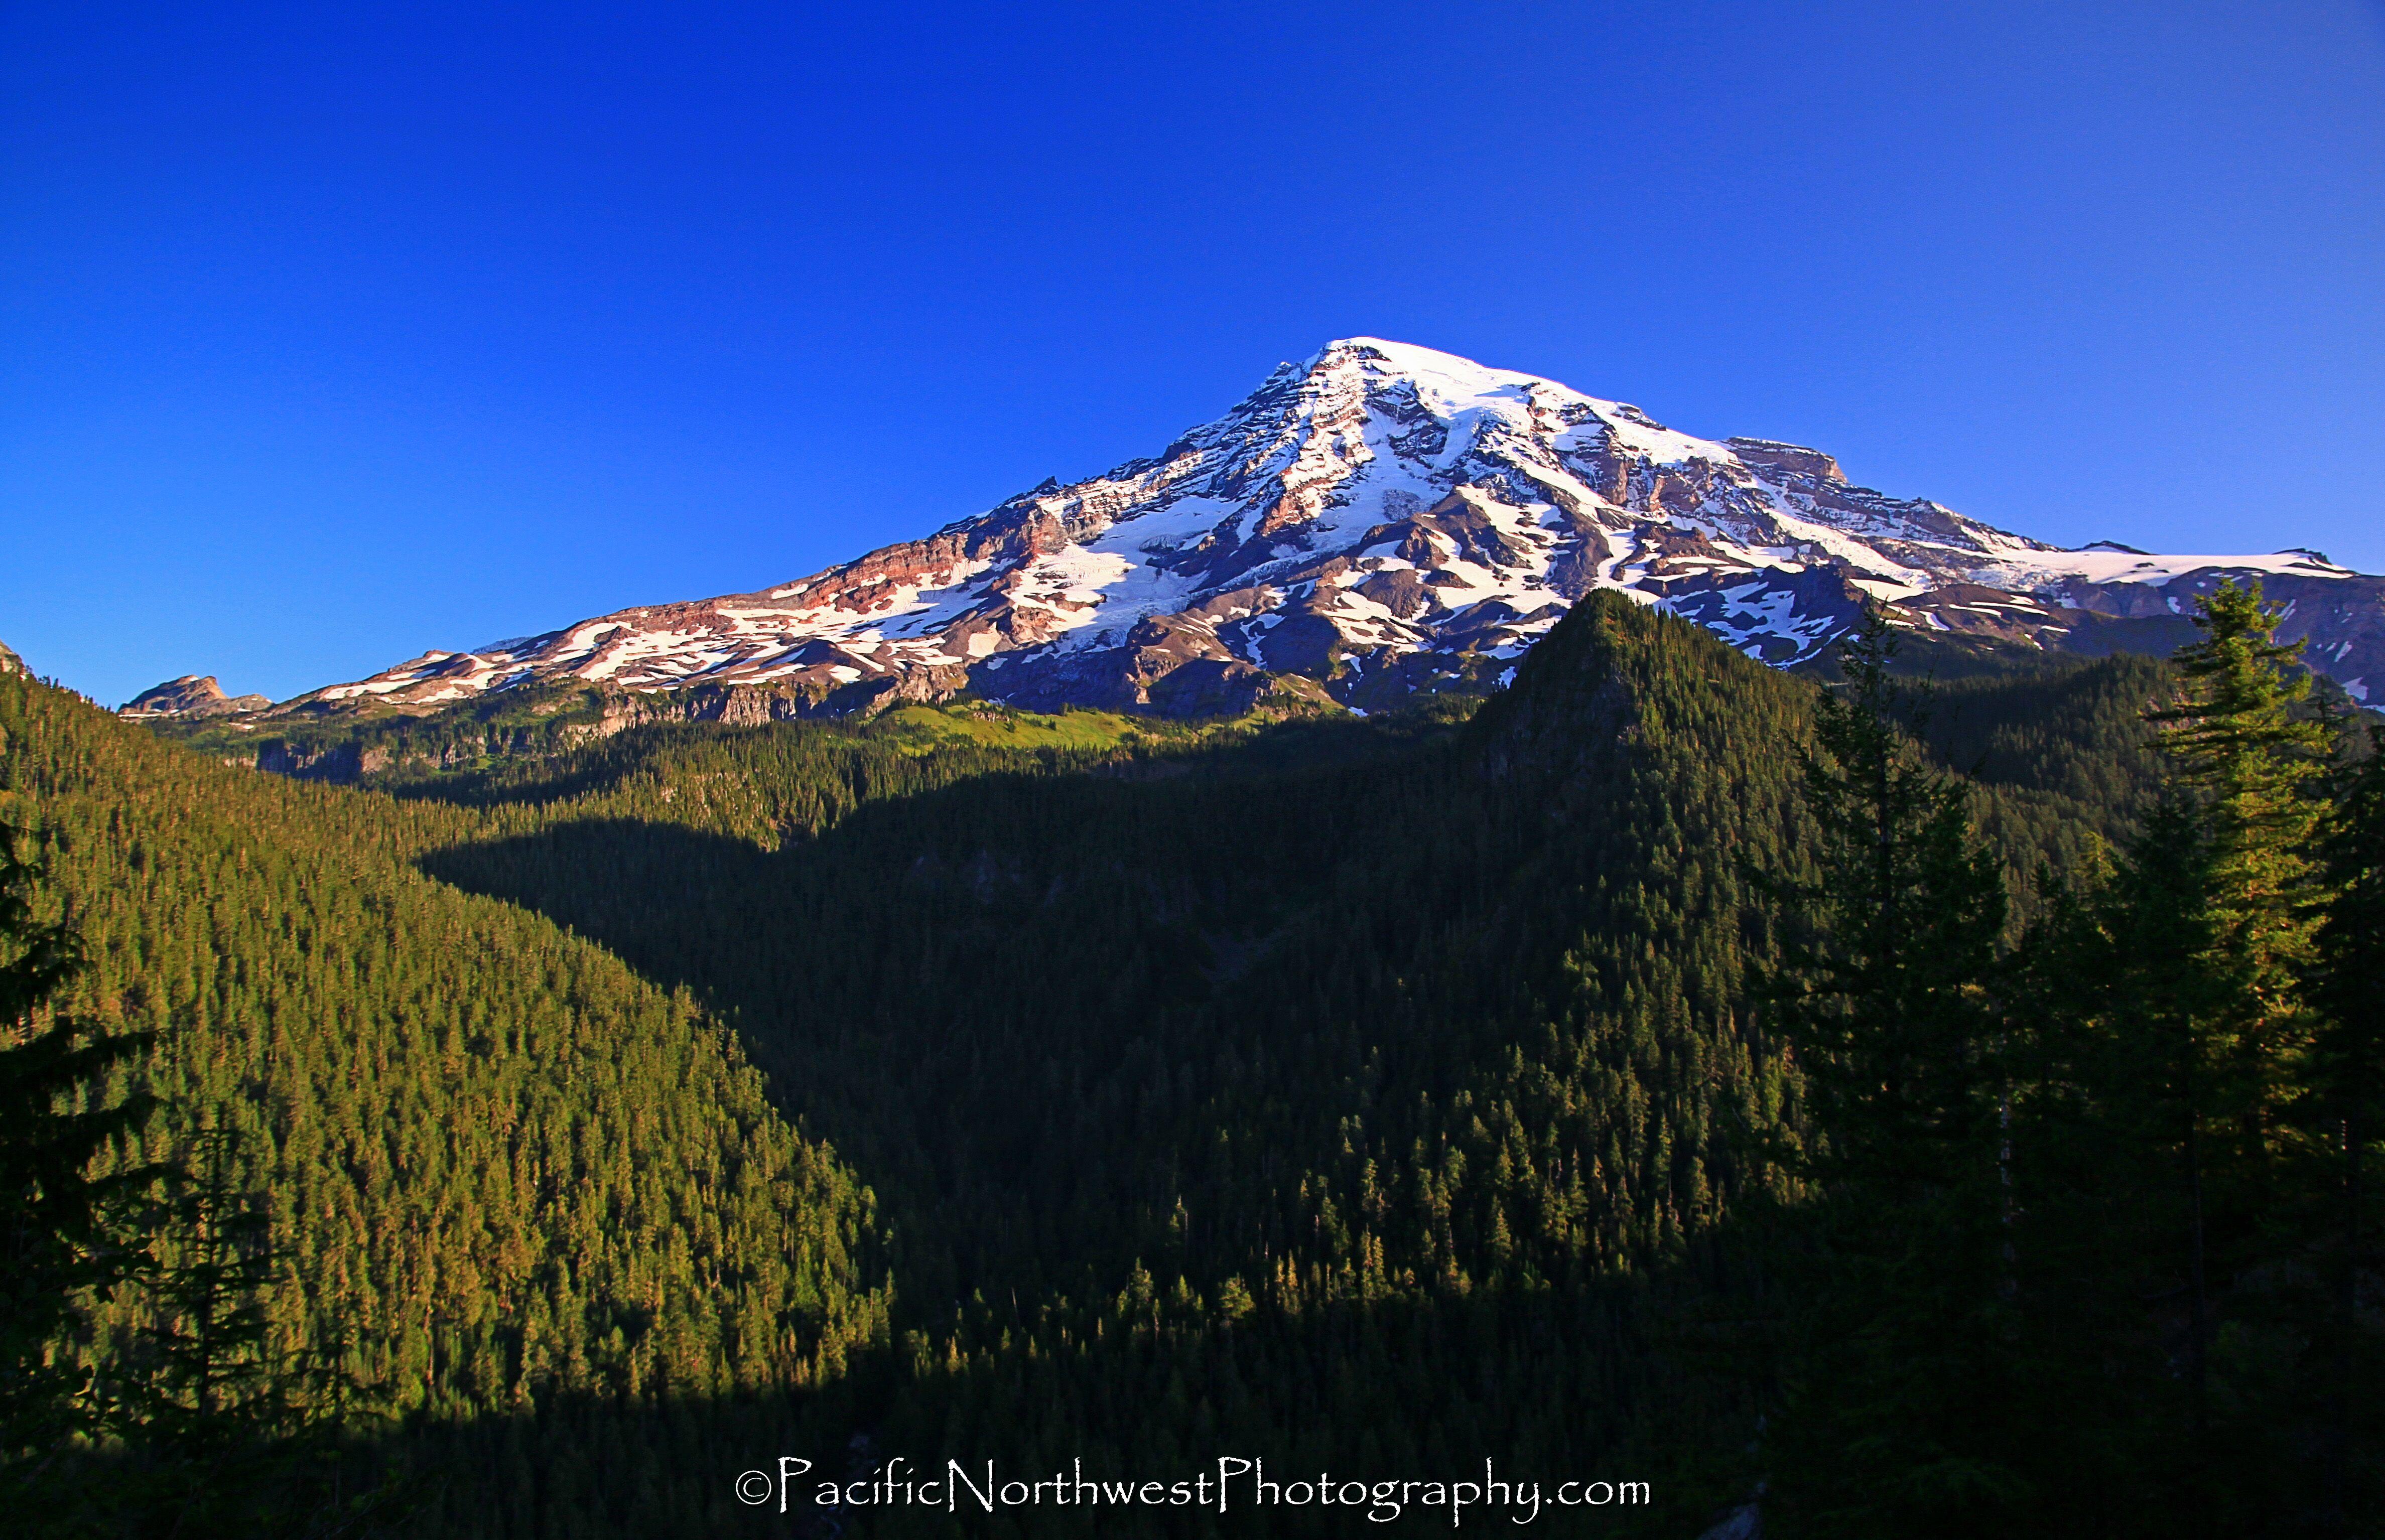 14,410 foot Mt. Rainier